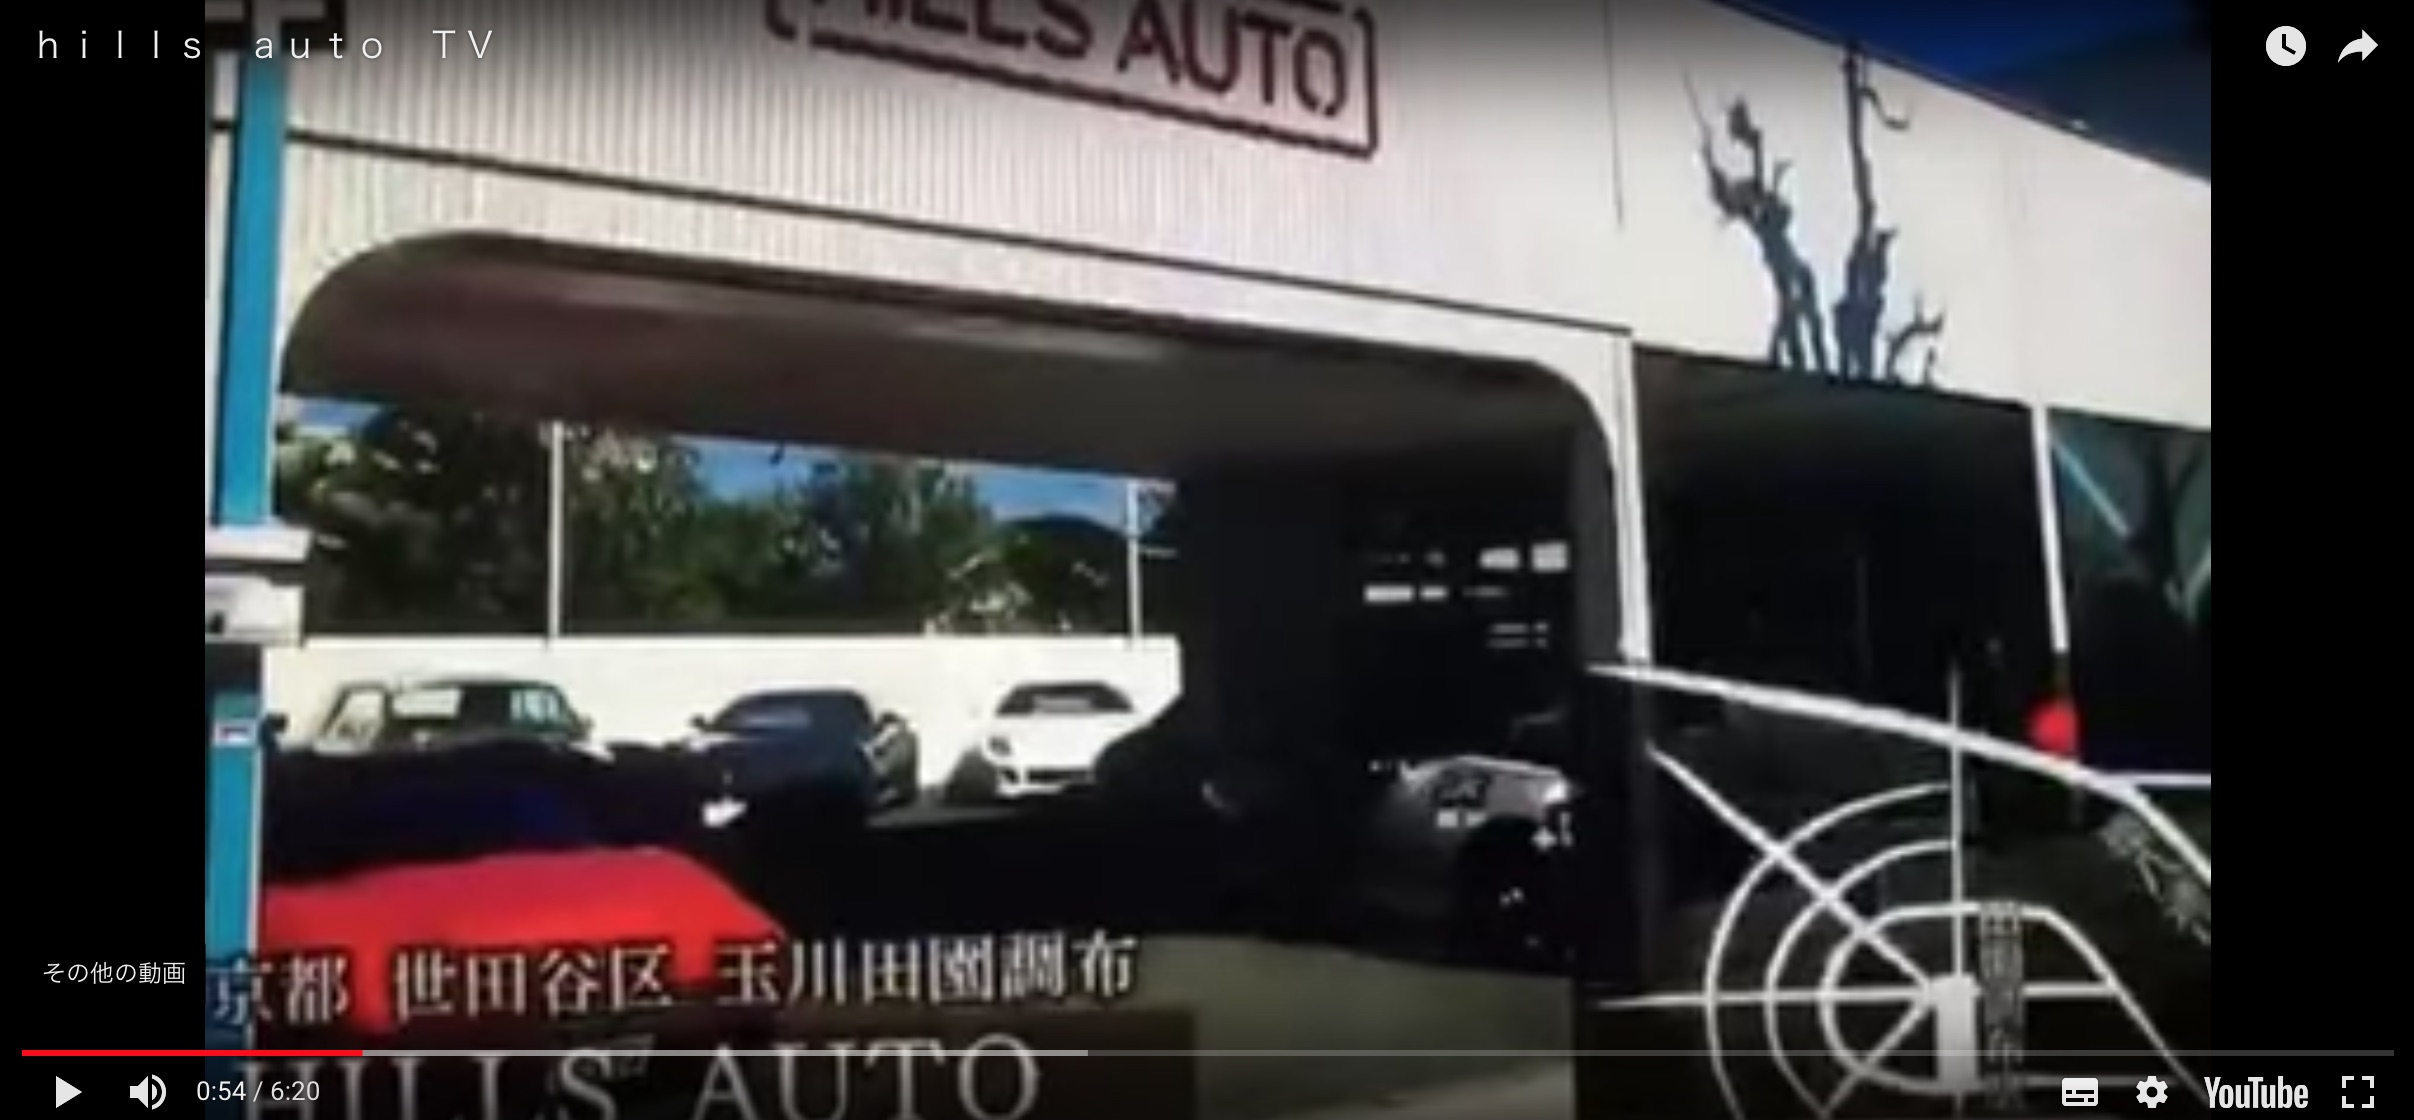 hills auto TV_-_YouTube